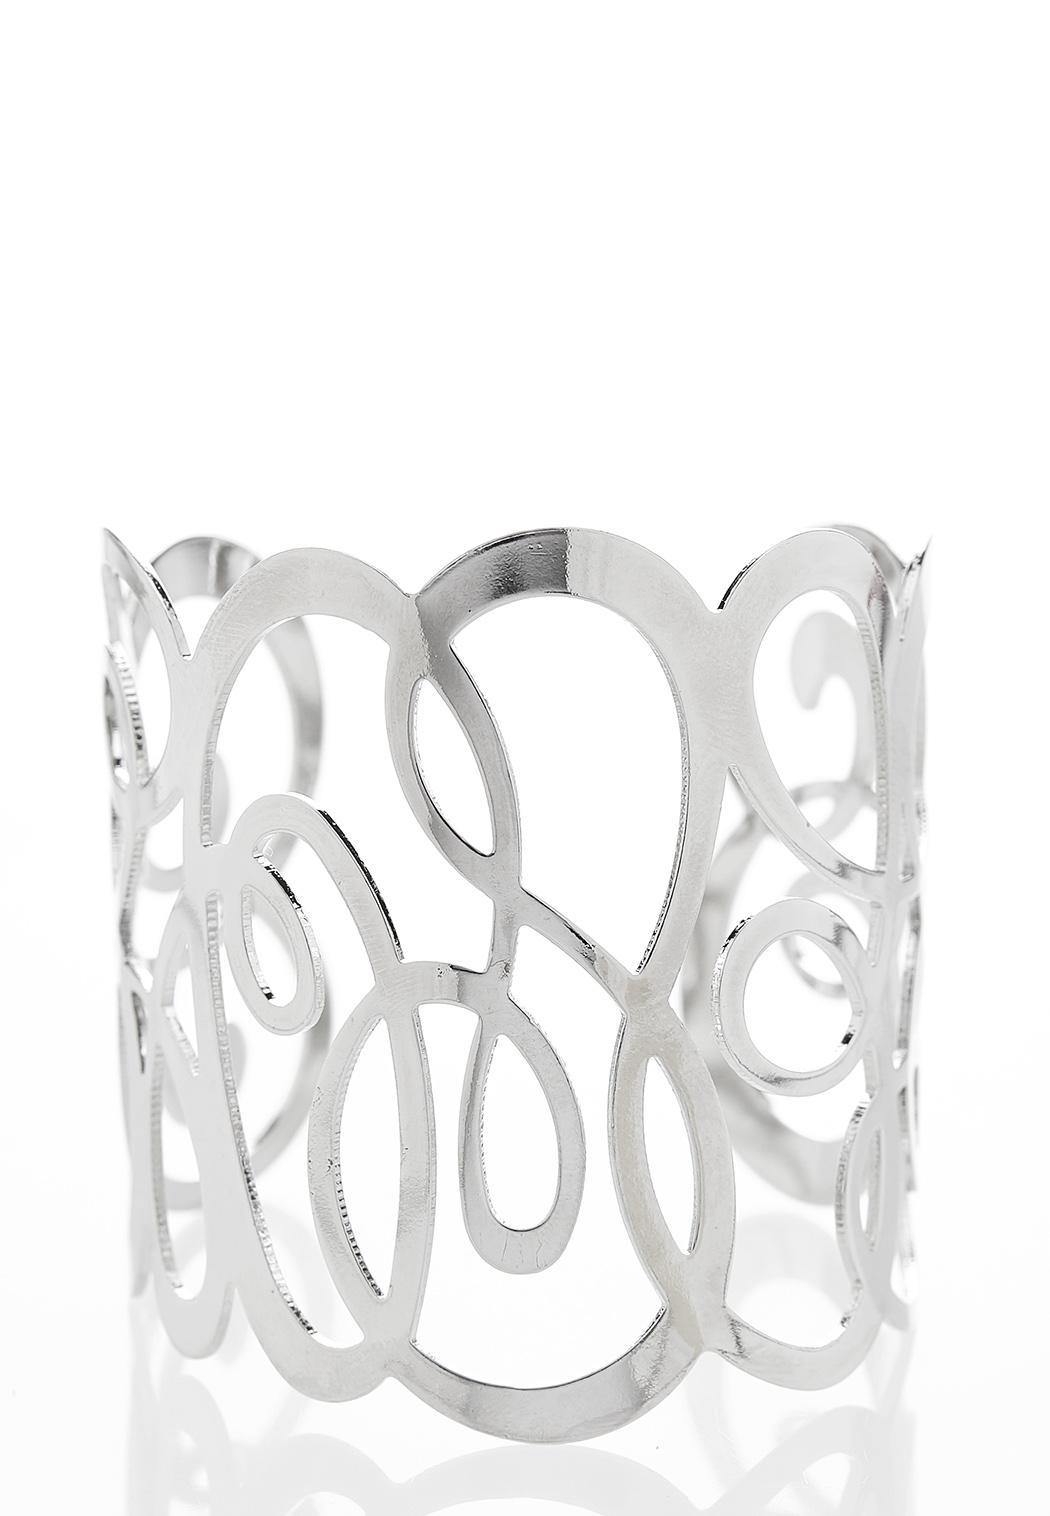 Swirled Metal Cuff